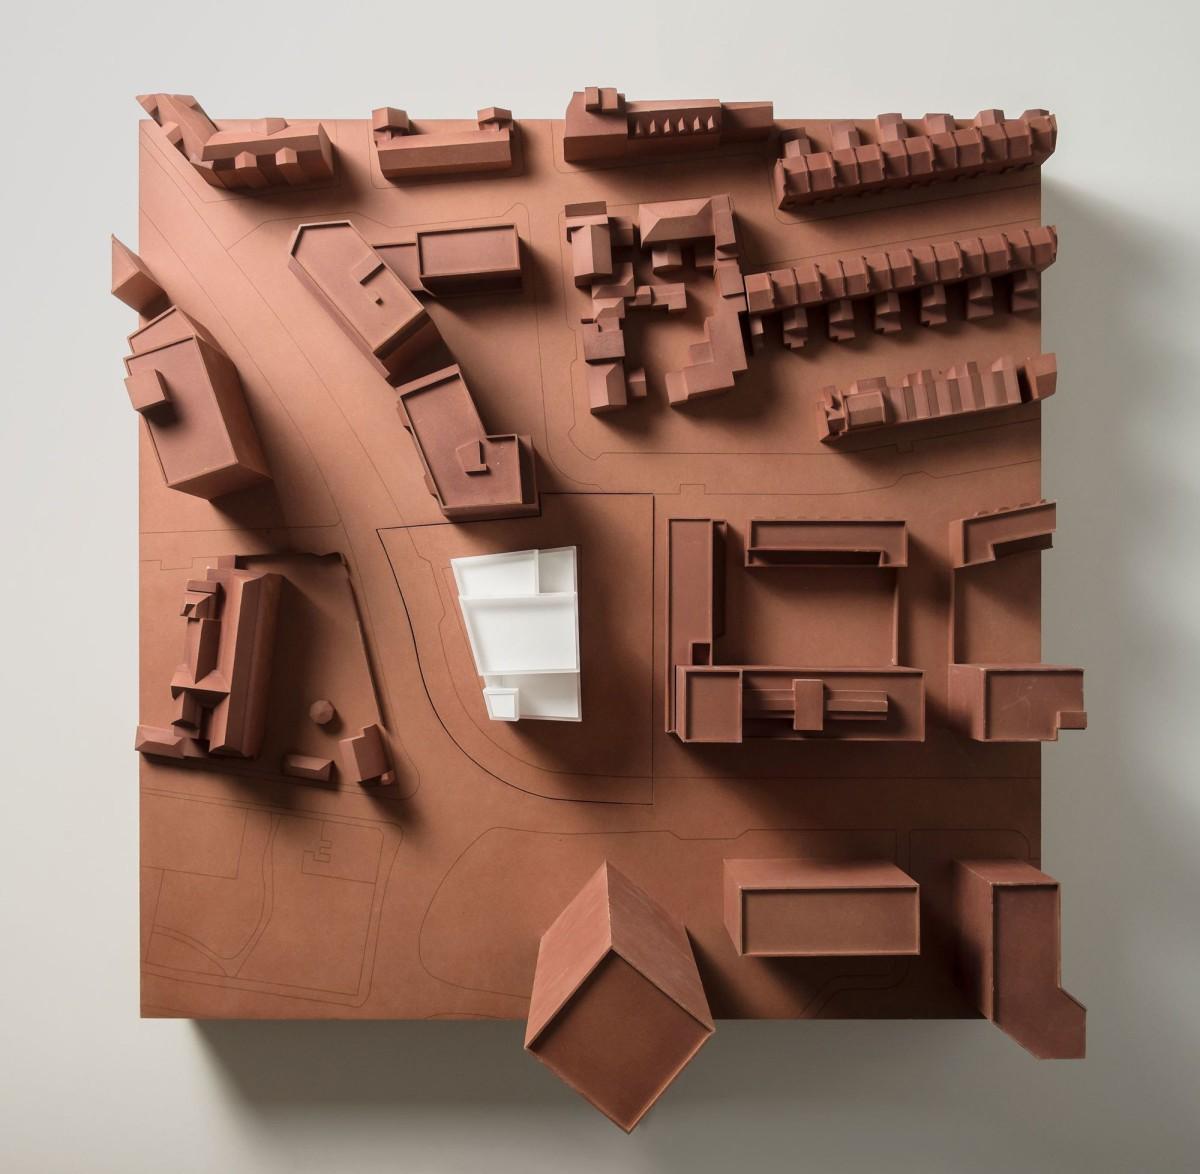 MORRIS-COMPANY-.-Elephant-Castle-energy-centre-.-London-14